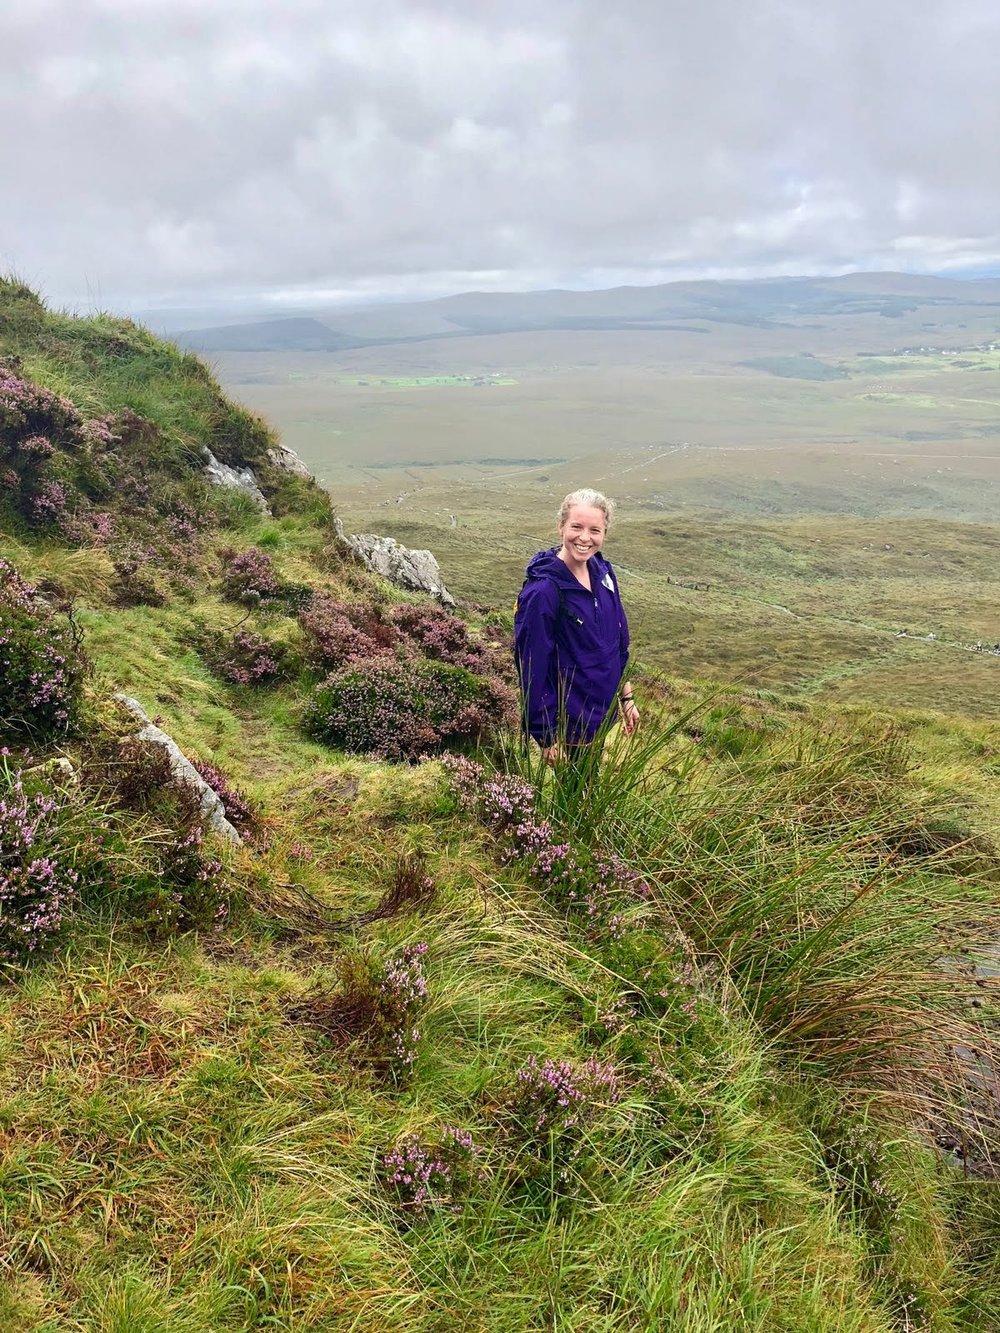 Lisa in her homeland - ireland!